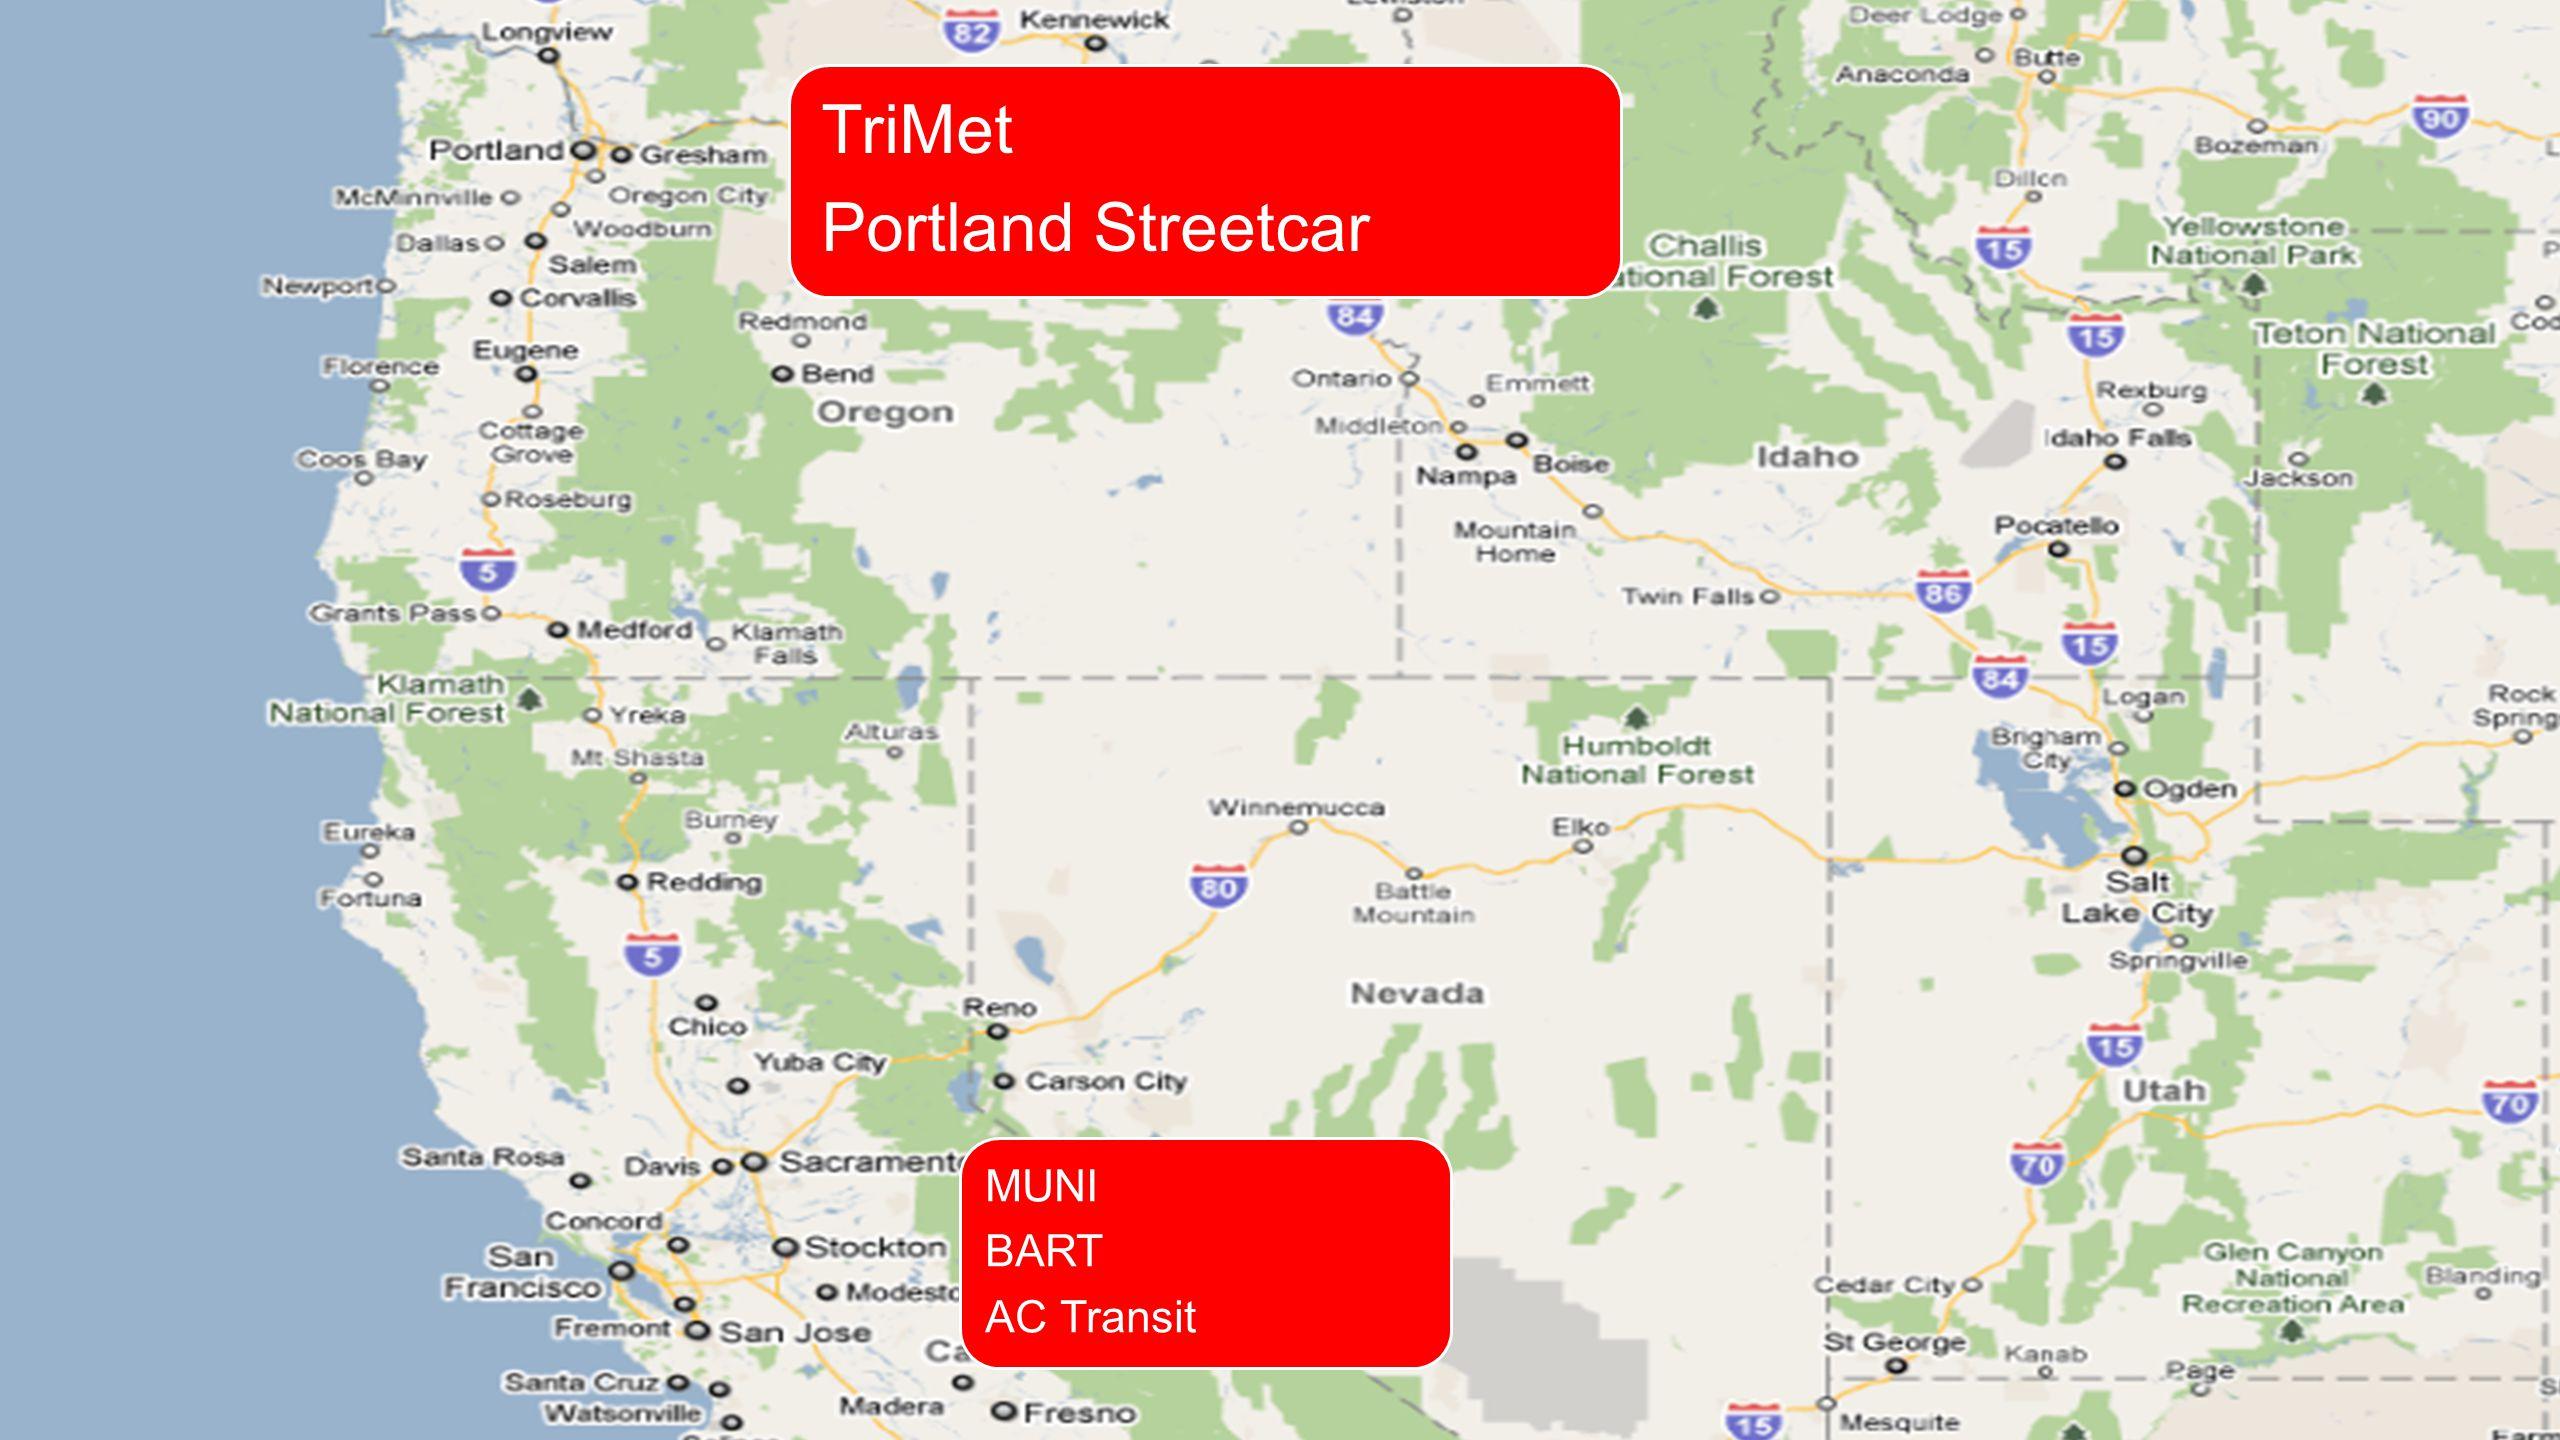 TriMet Portland Streetcar MUNI BART AC Transit